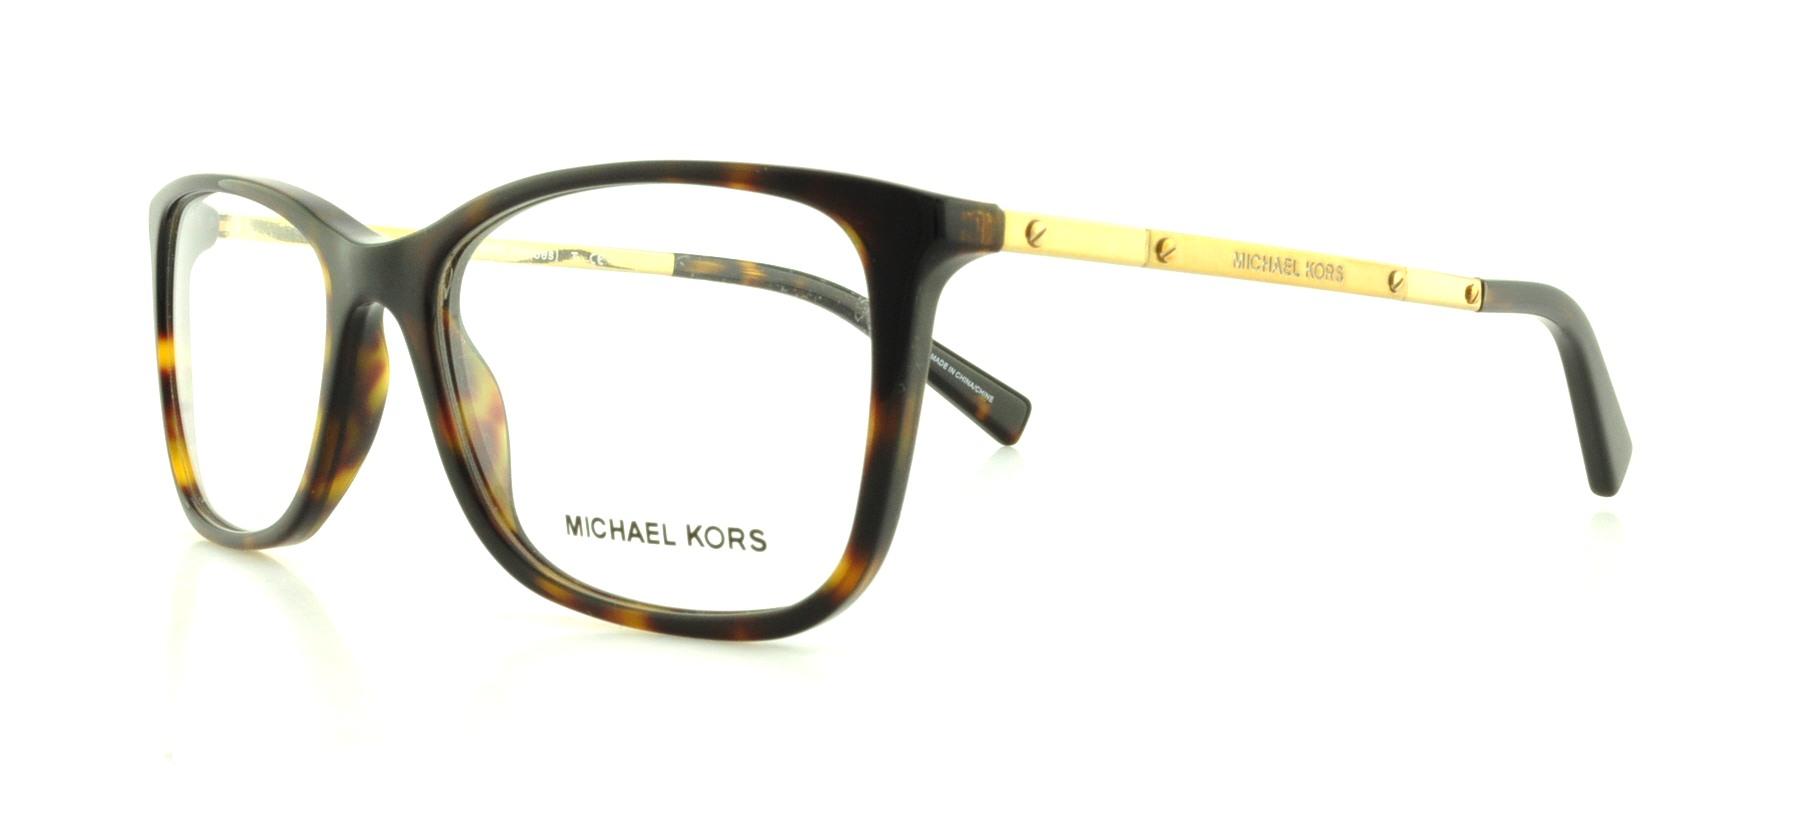 621caa9c2b Designer Frames Outlet. Michael Kors MK4016 Antibes